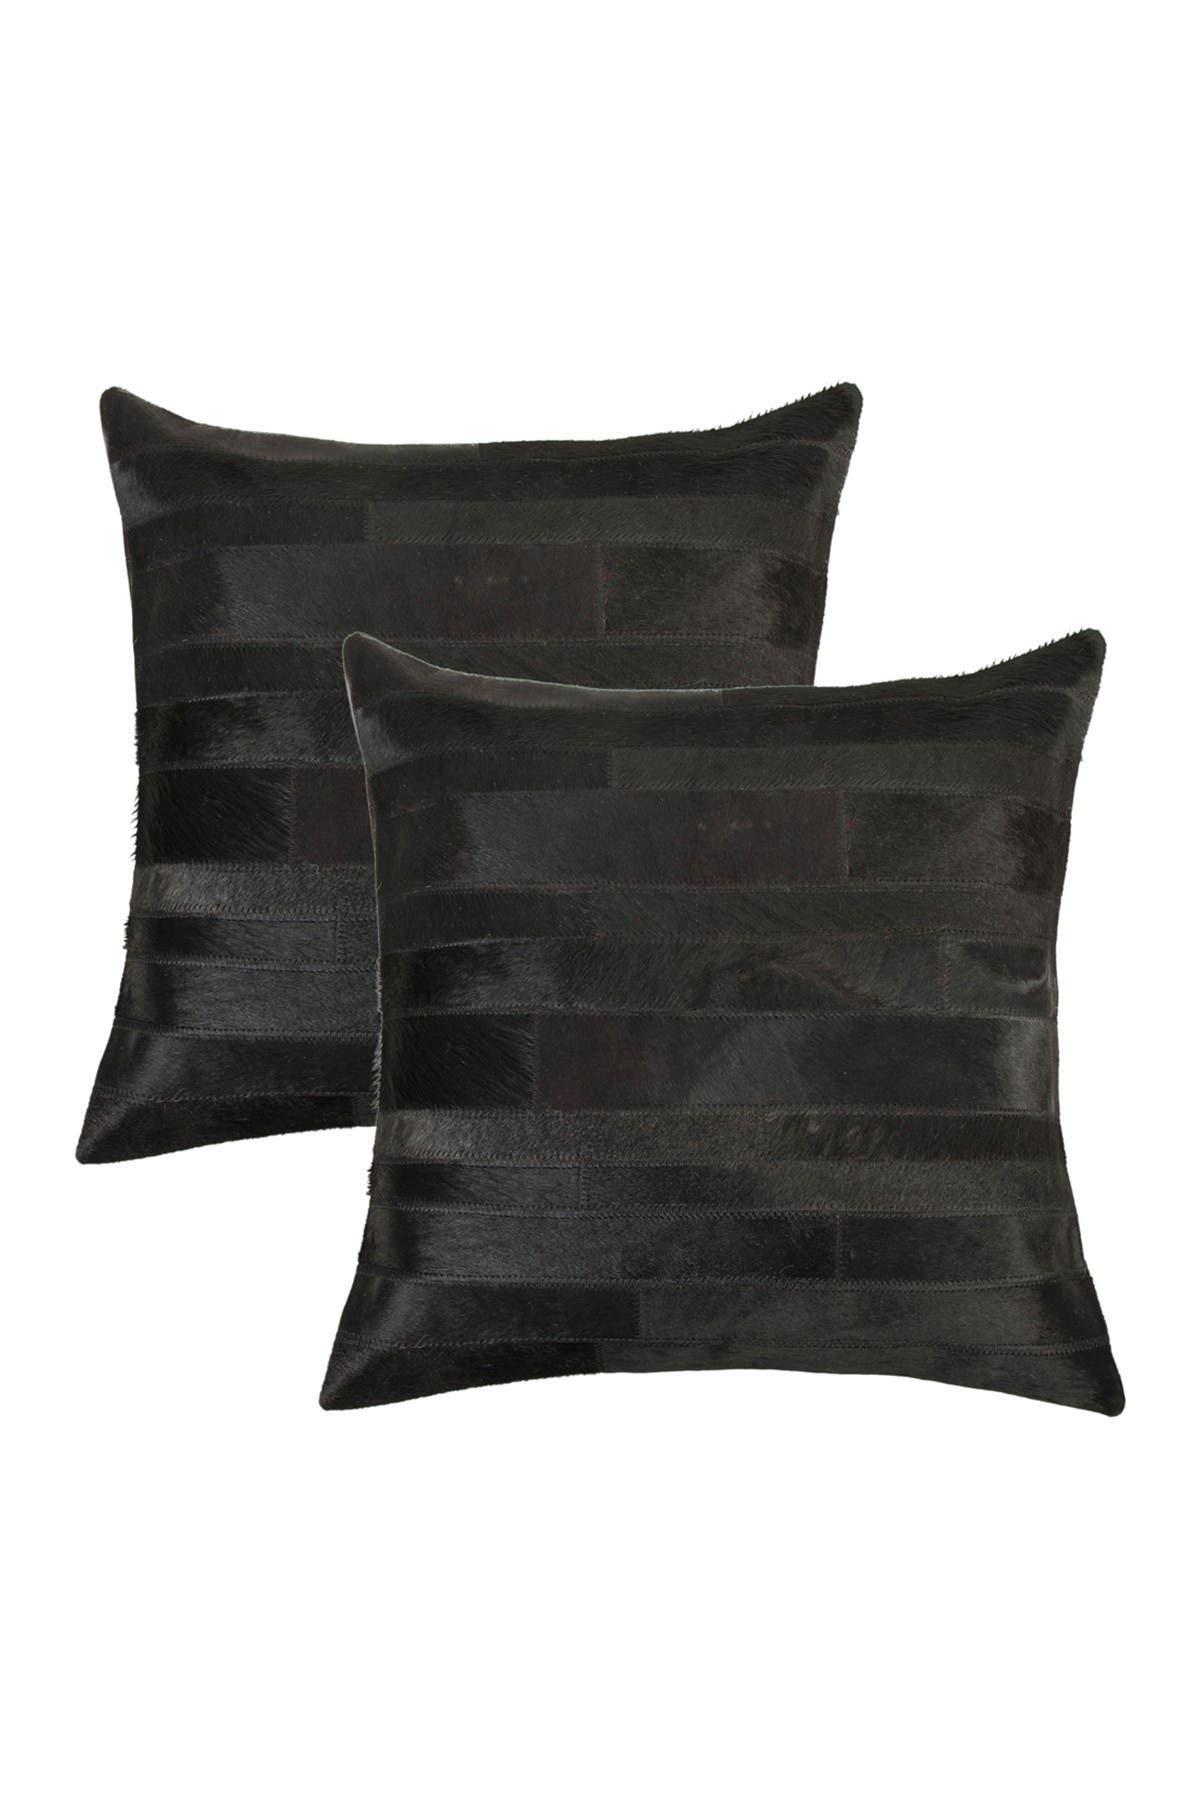 "Image of Natural Torino Madrid Pillow 18"" X 18"" - Black - Pack of 2"